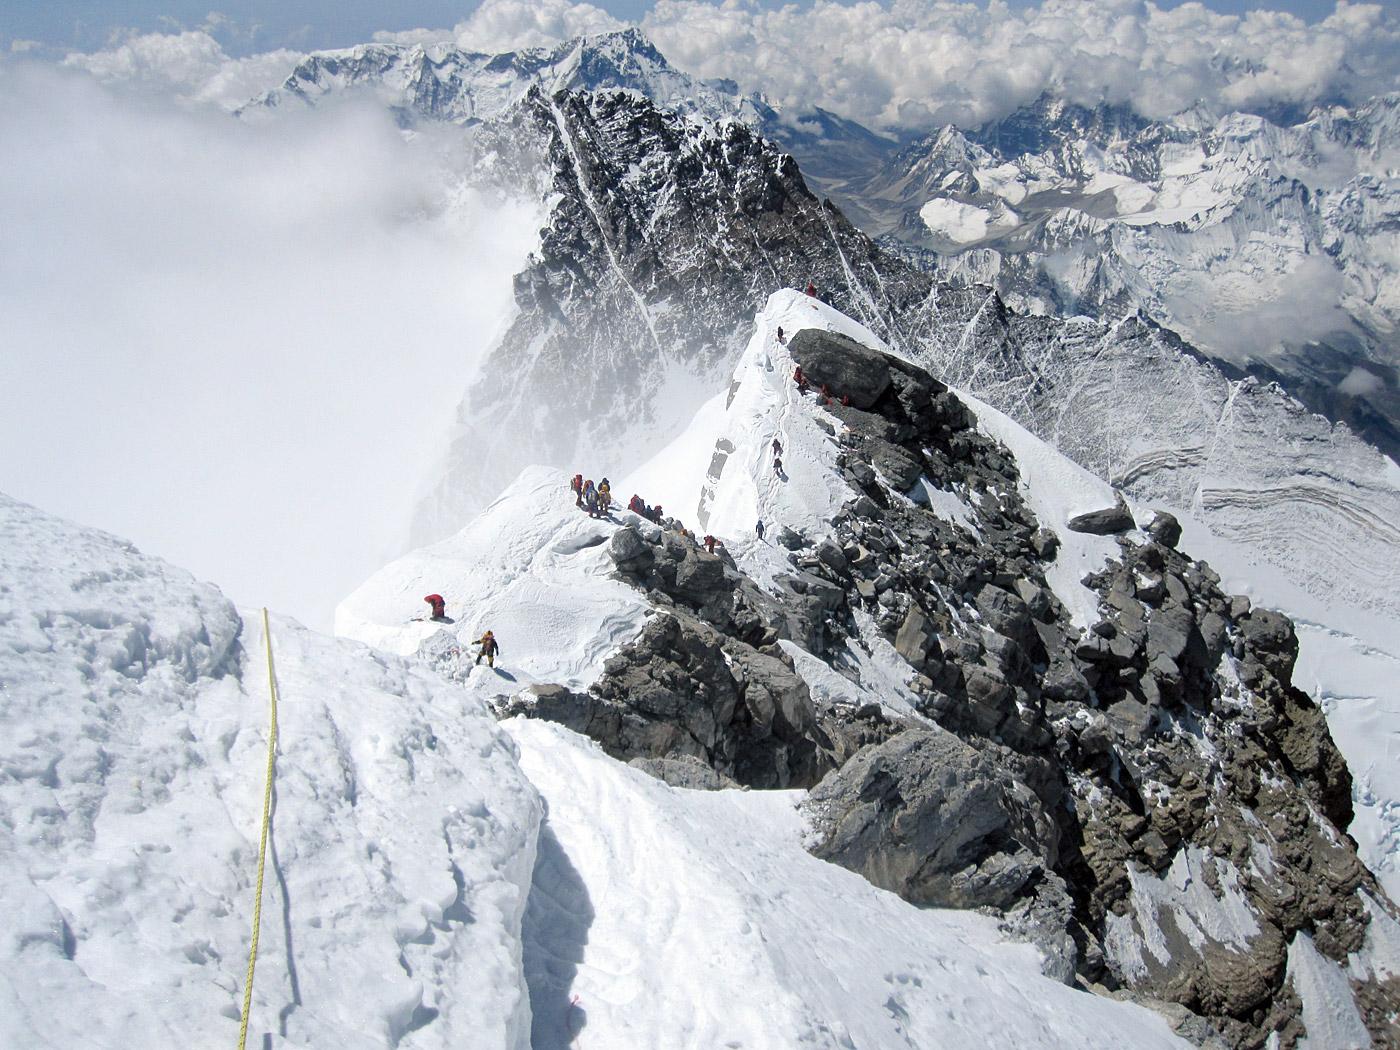 Photo courtesy of International Mountain Guides